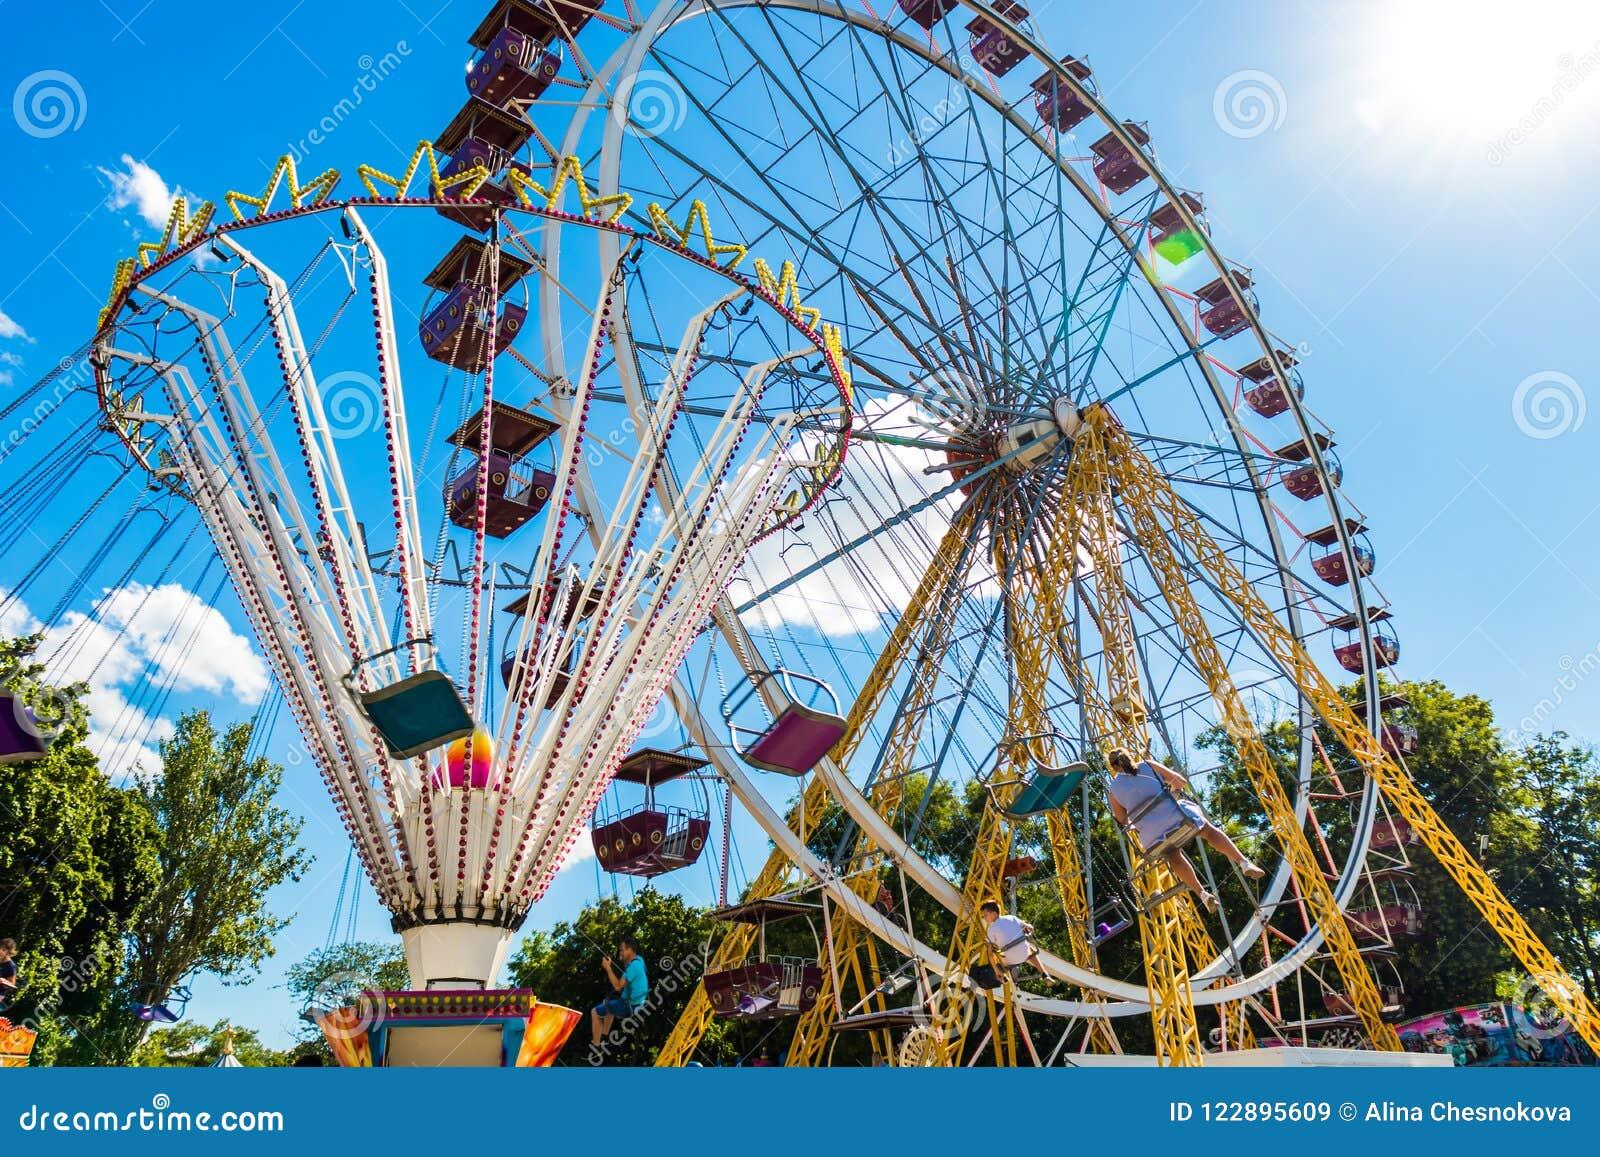 amusement-park-carousel-ferris-wheel-amu